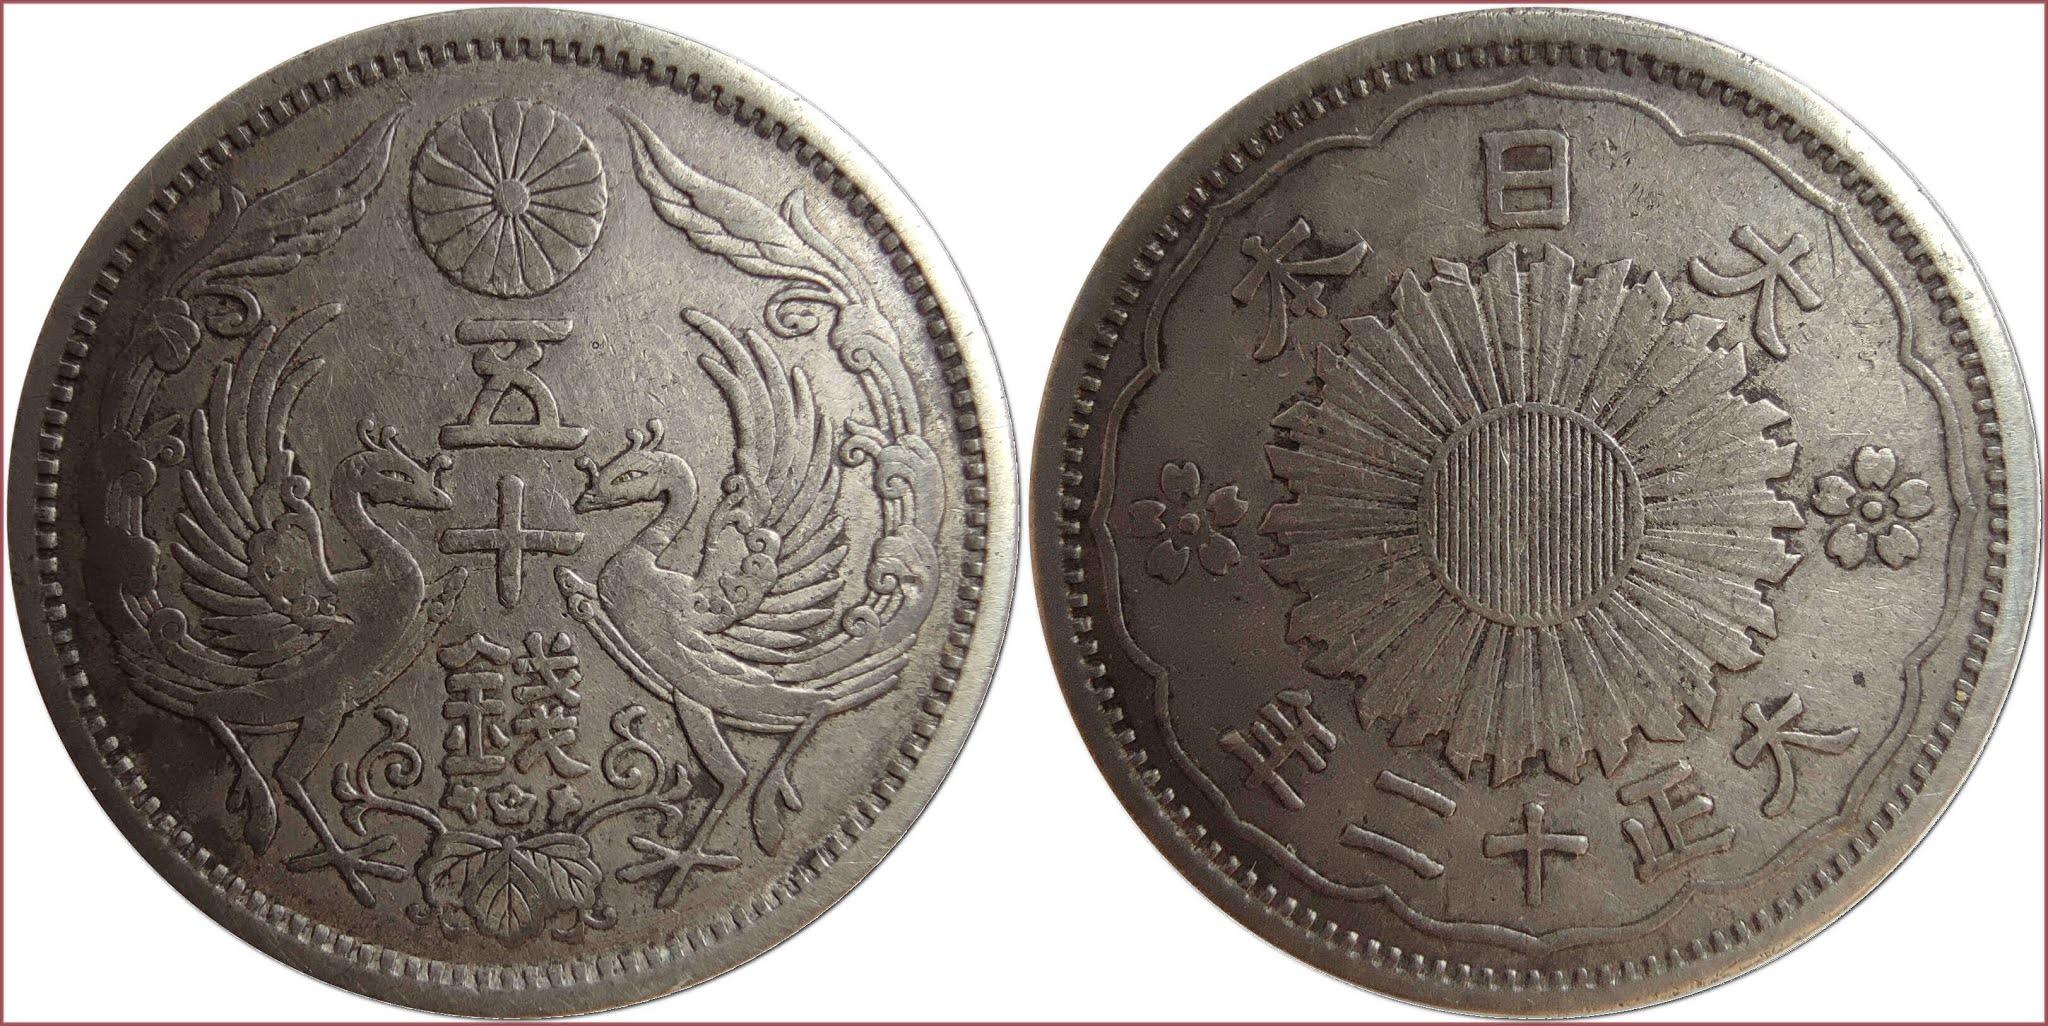 50 sen (銭), 1923: Empire of Japan